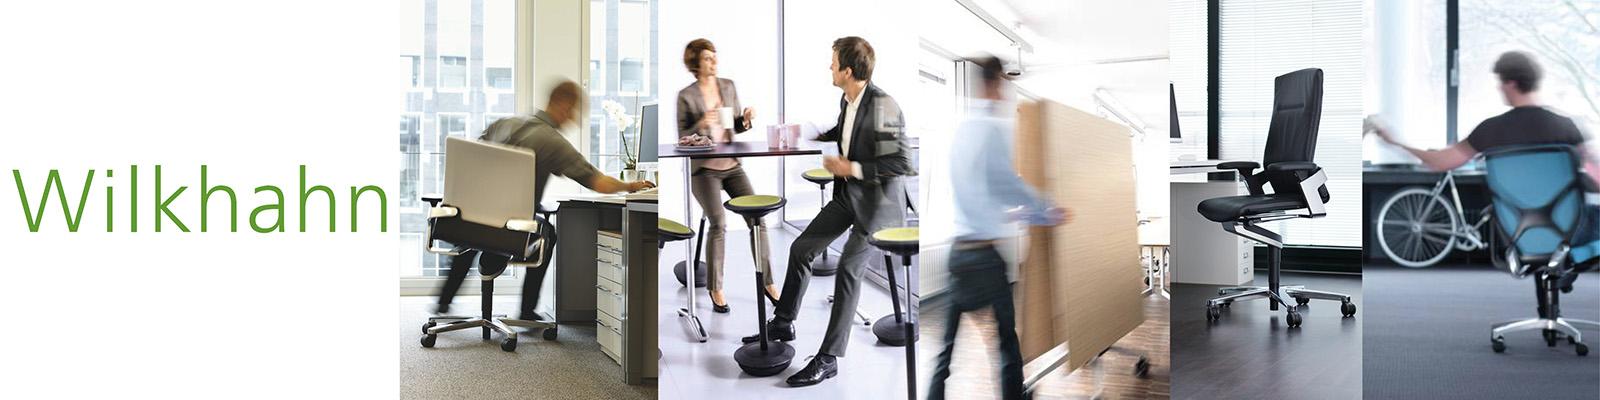 wilkhahn corporate workspace. Black Bedroom Furniture Sets. Home Design Ideas